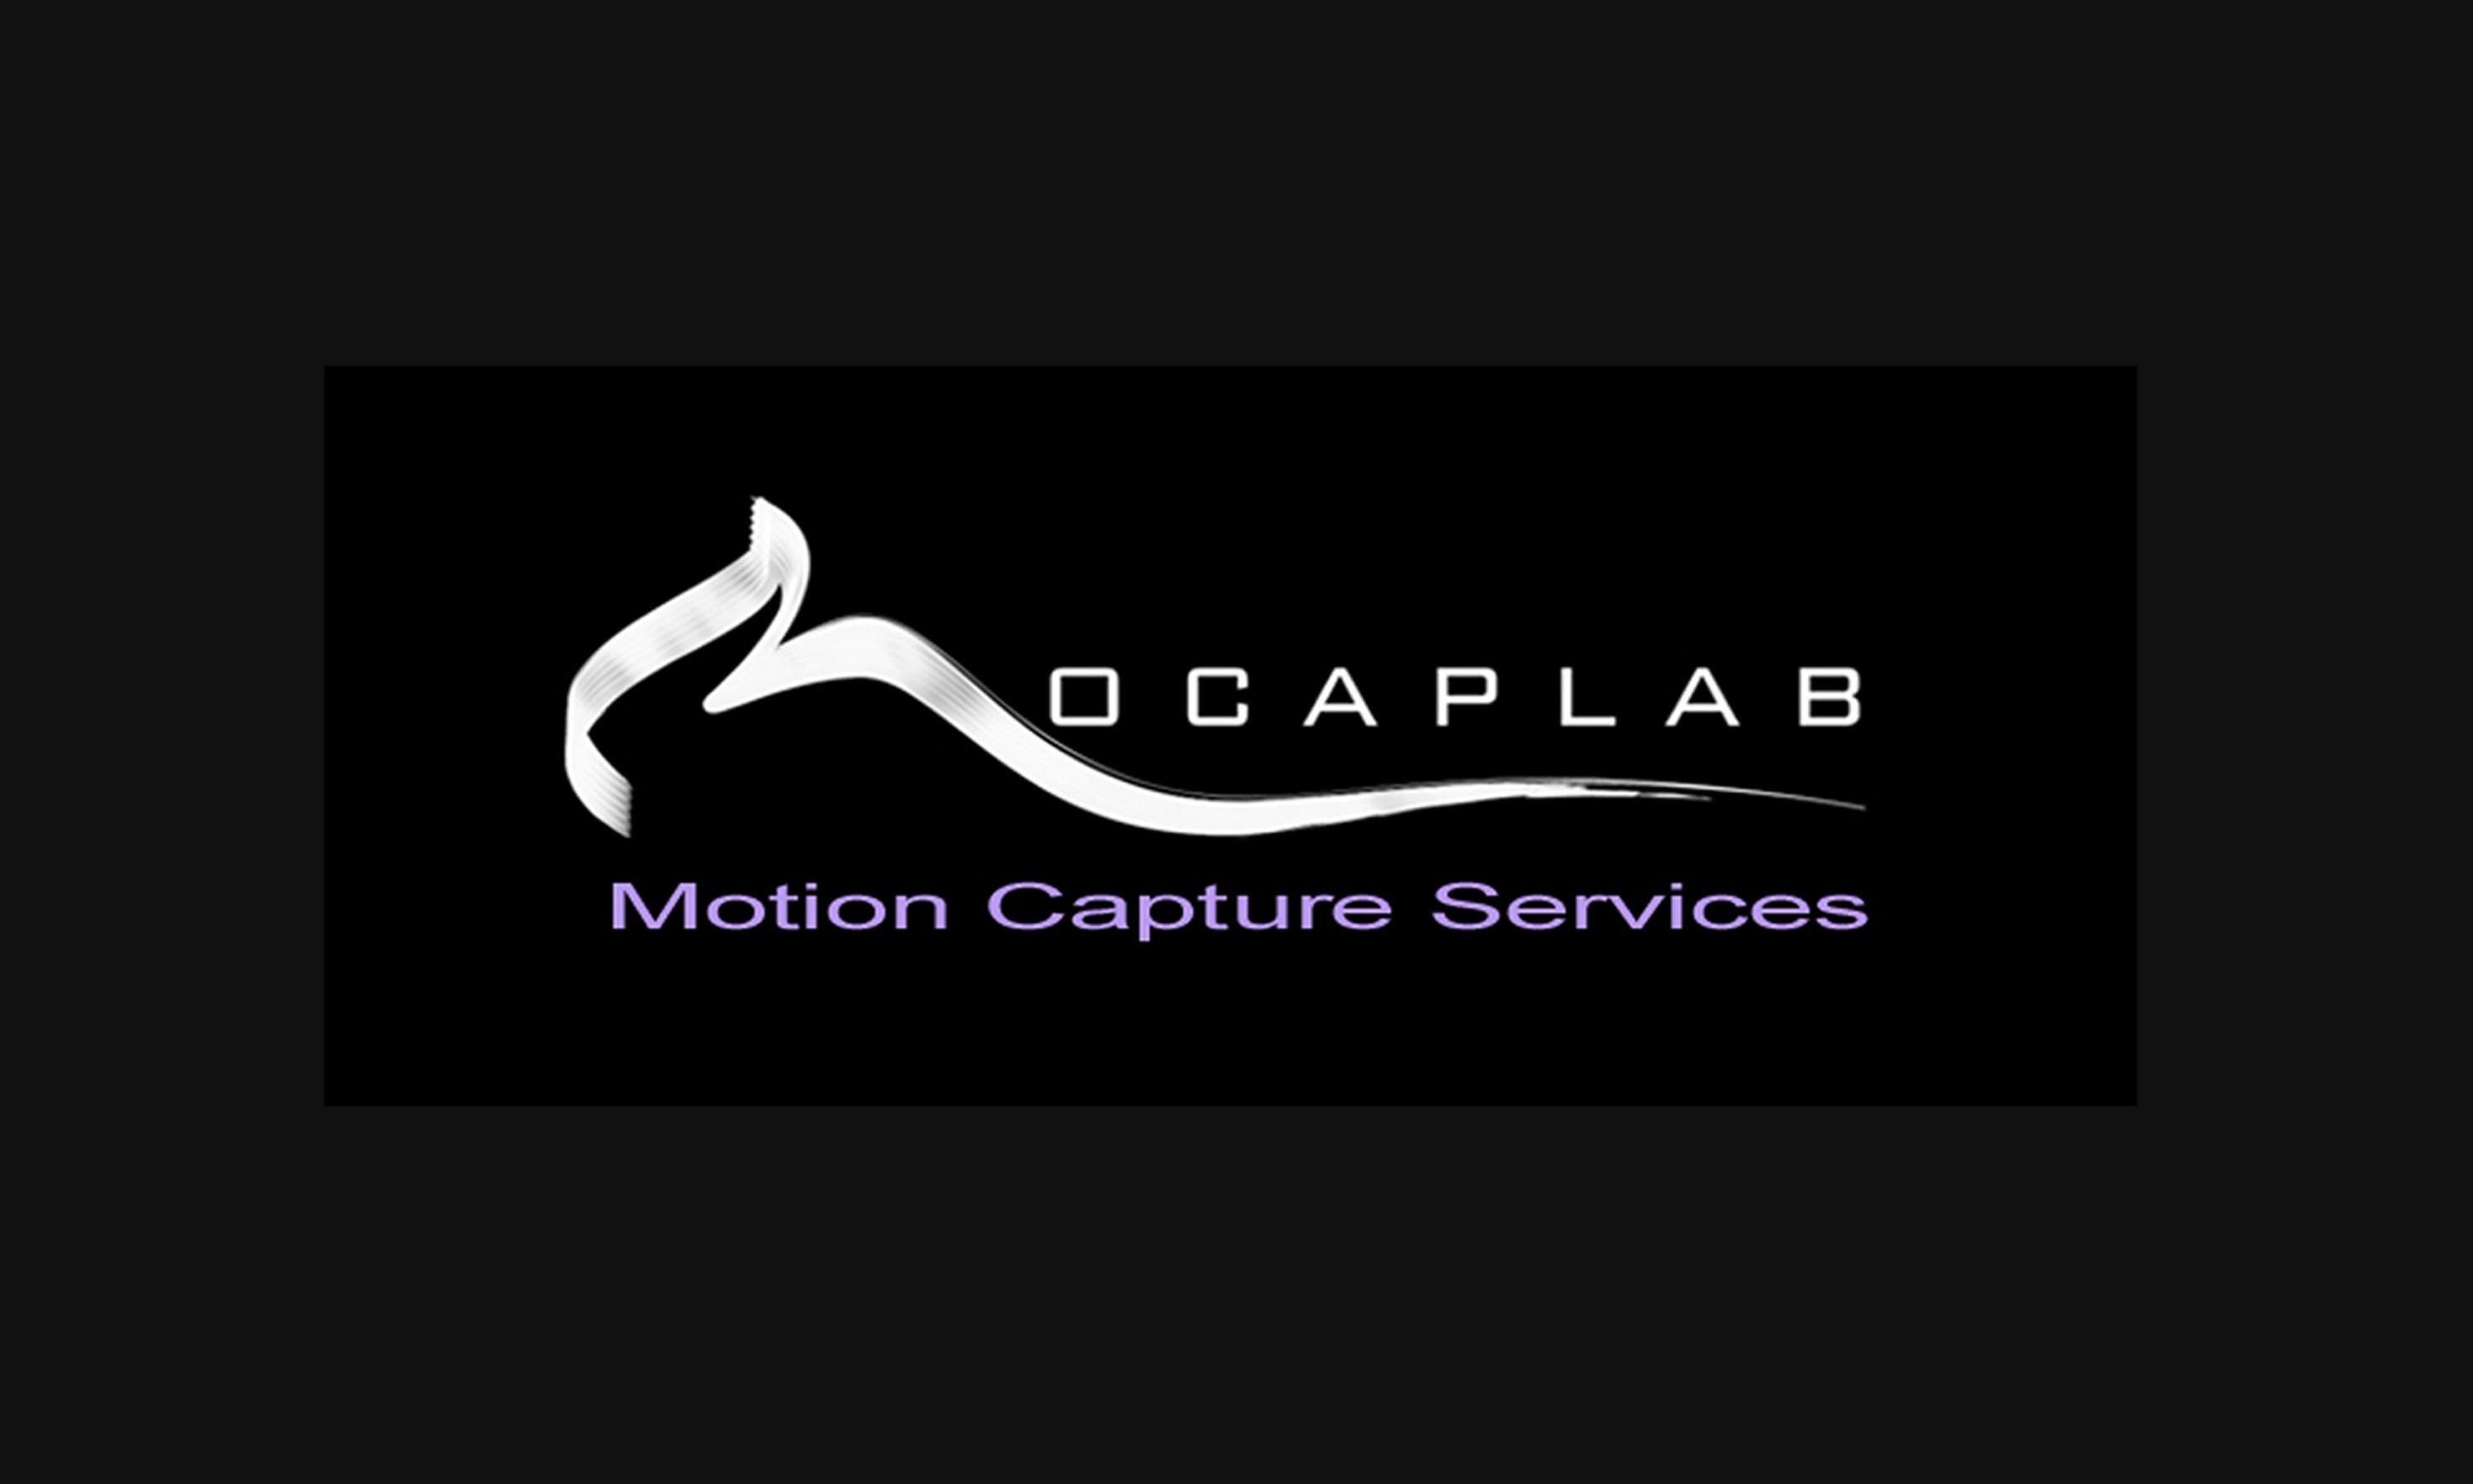 Plaque MocapLab